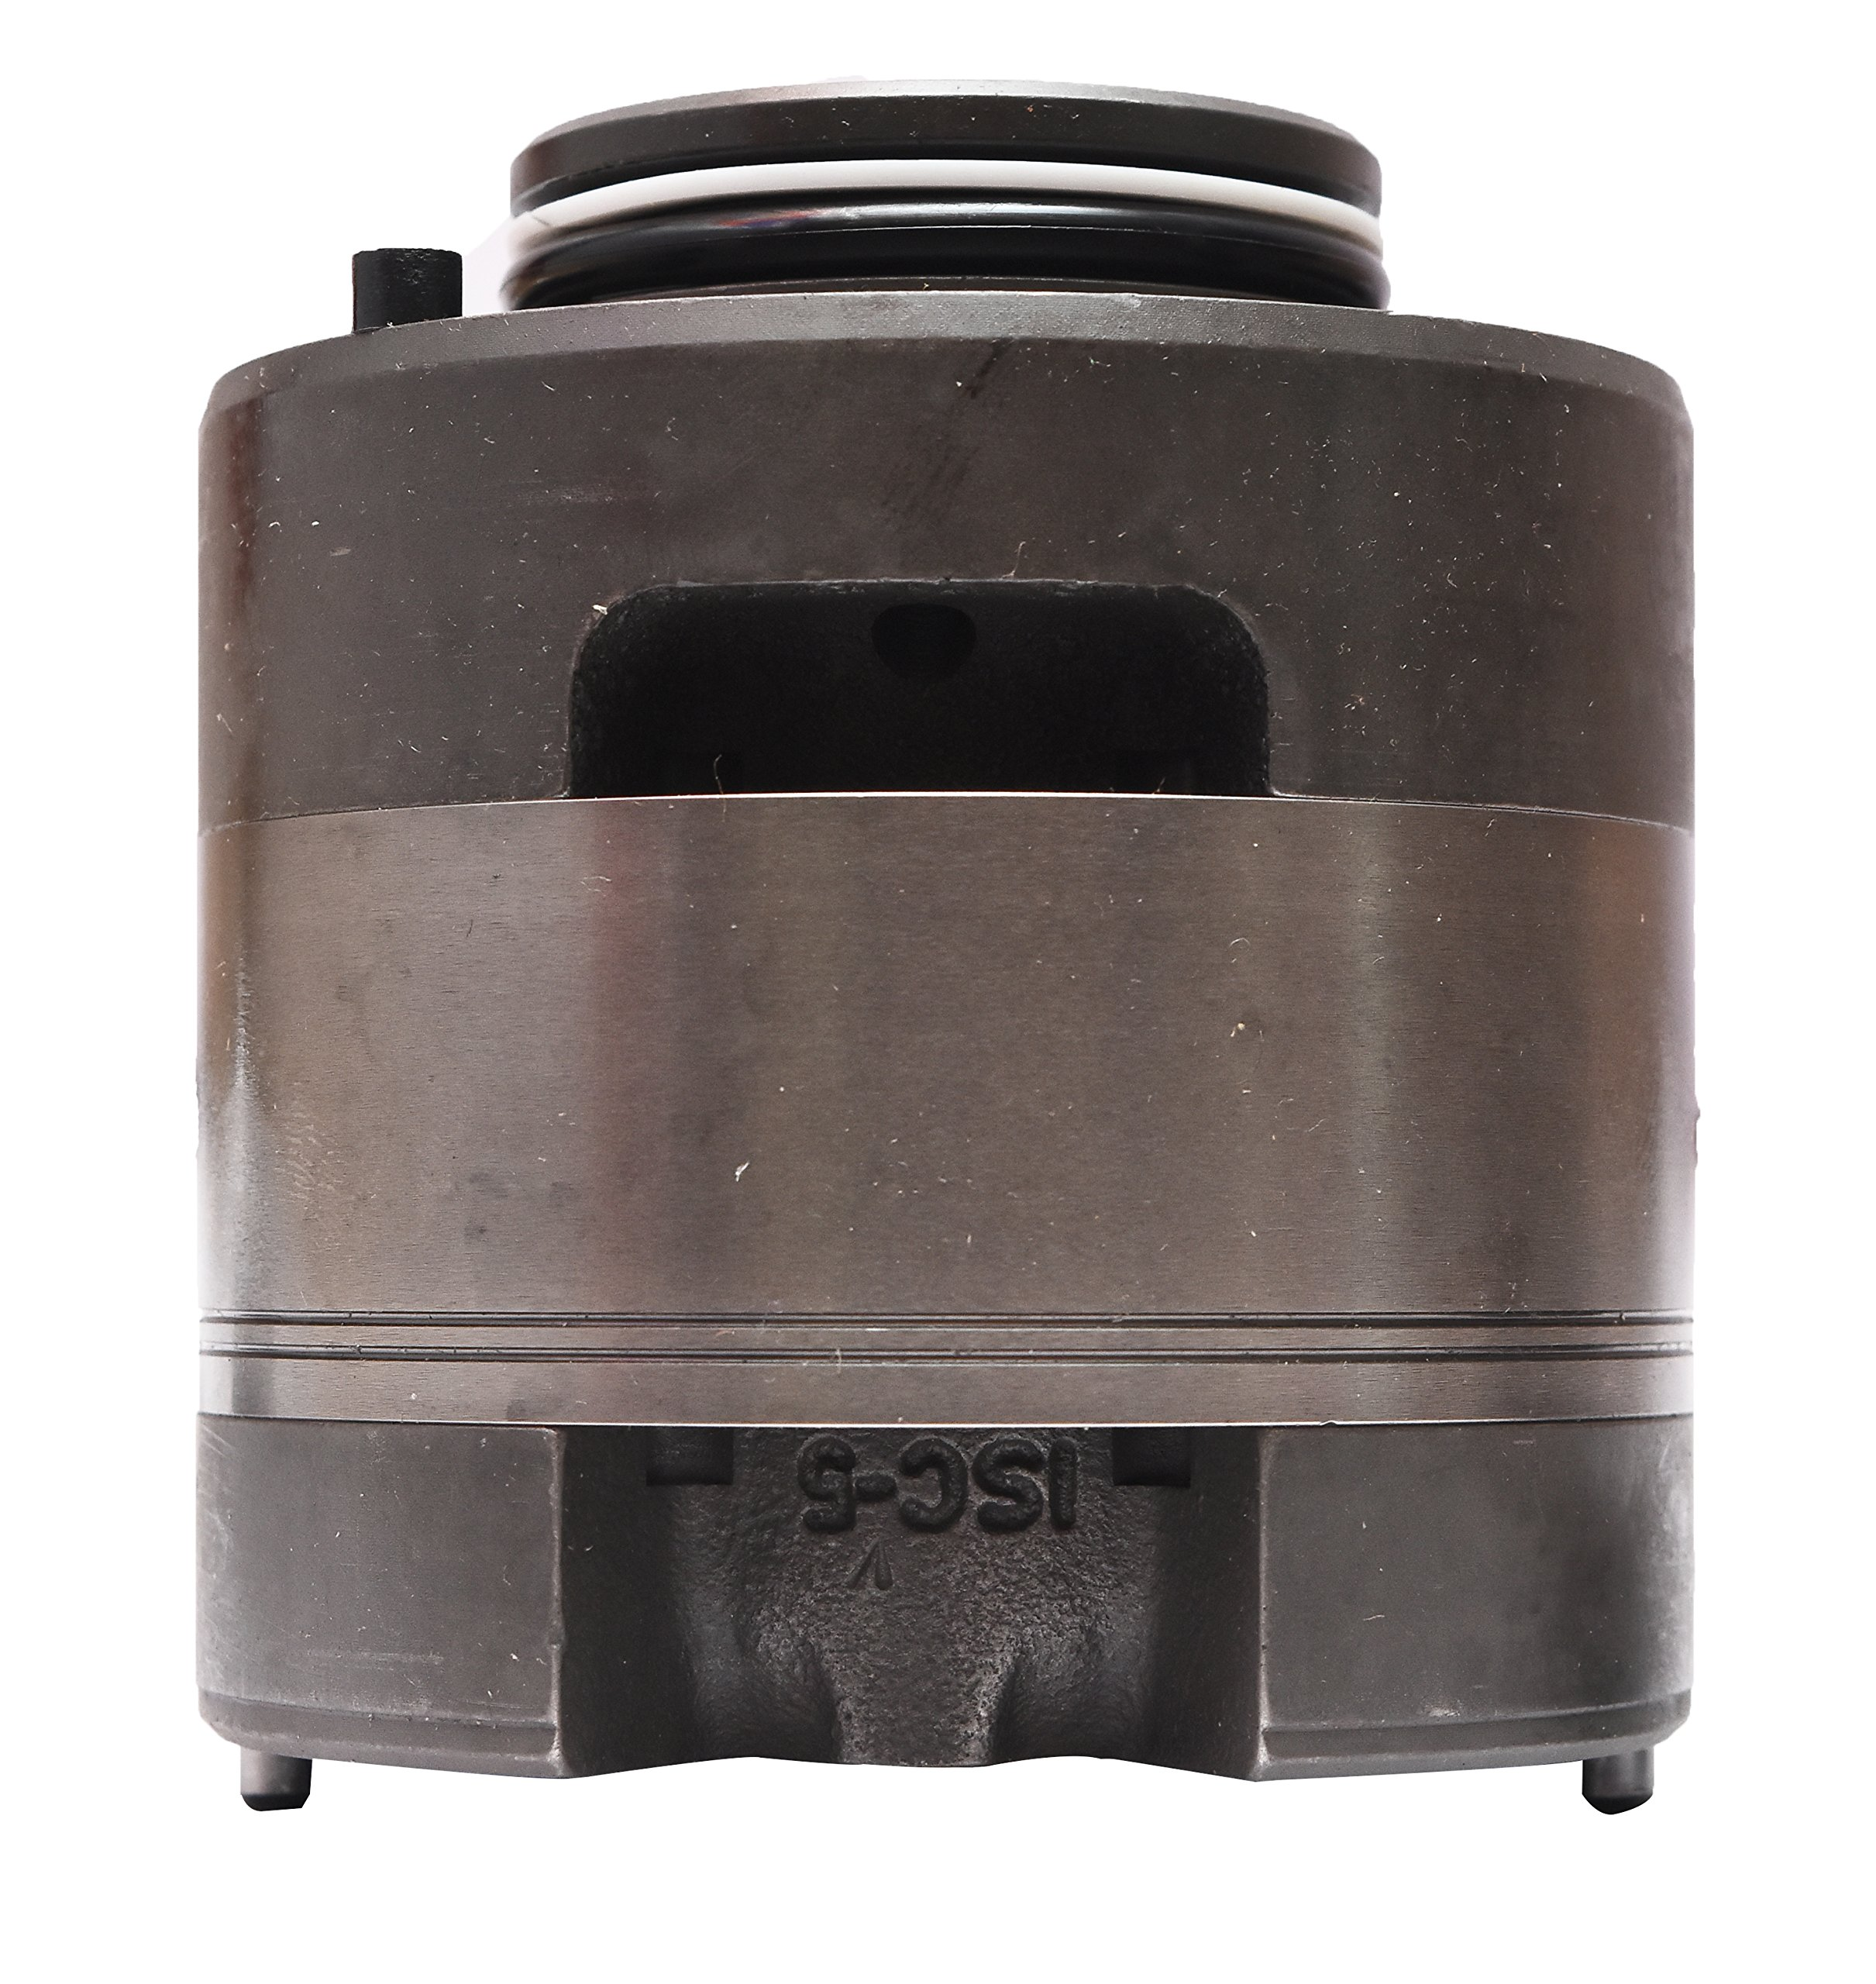 Yuken Hydraulic Vane Pump Spares Catridige Kit CPVR50-51-R-31